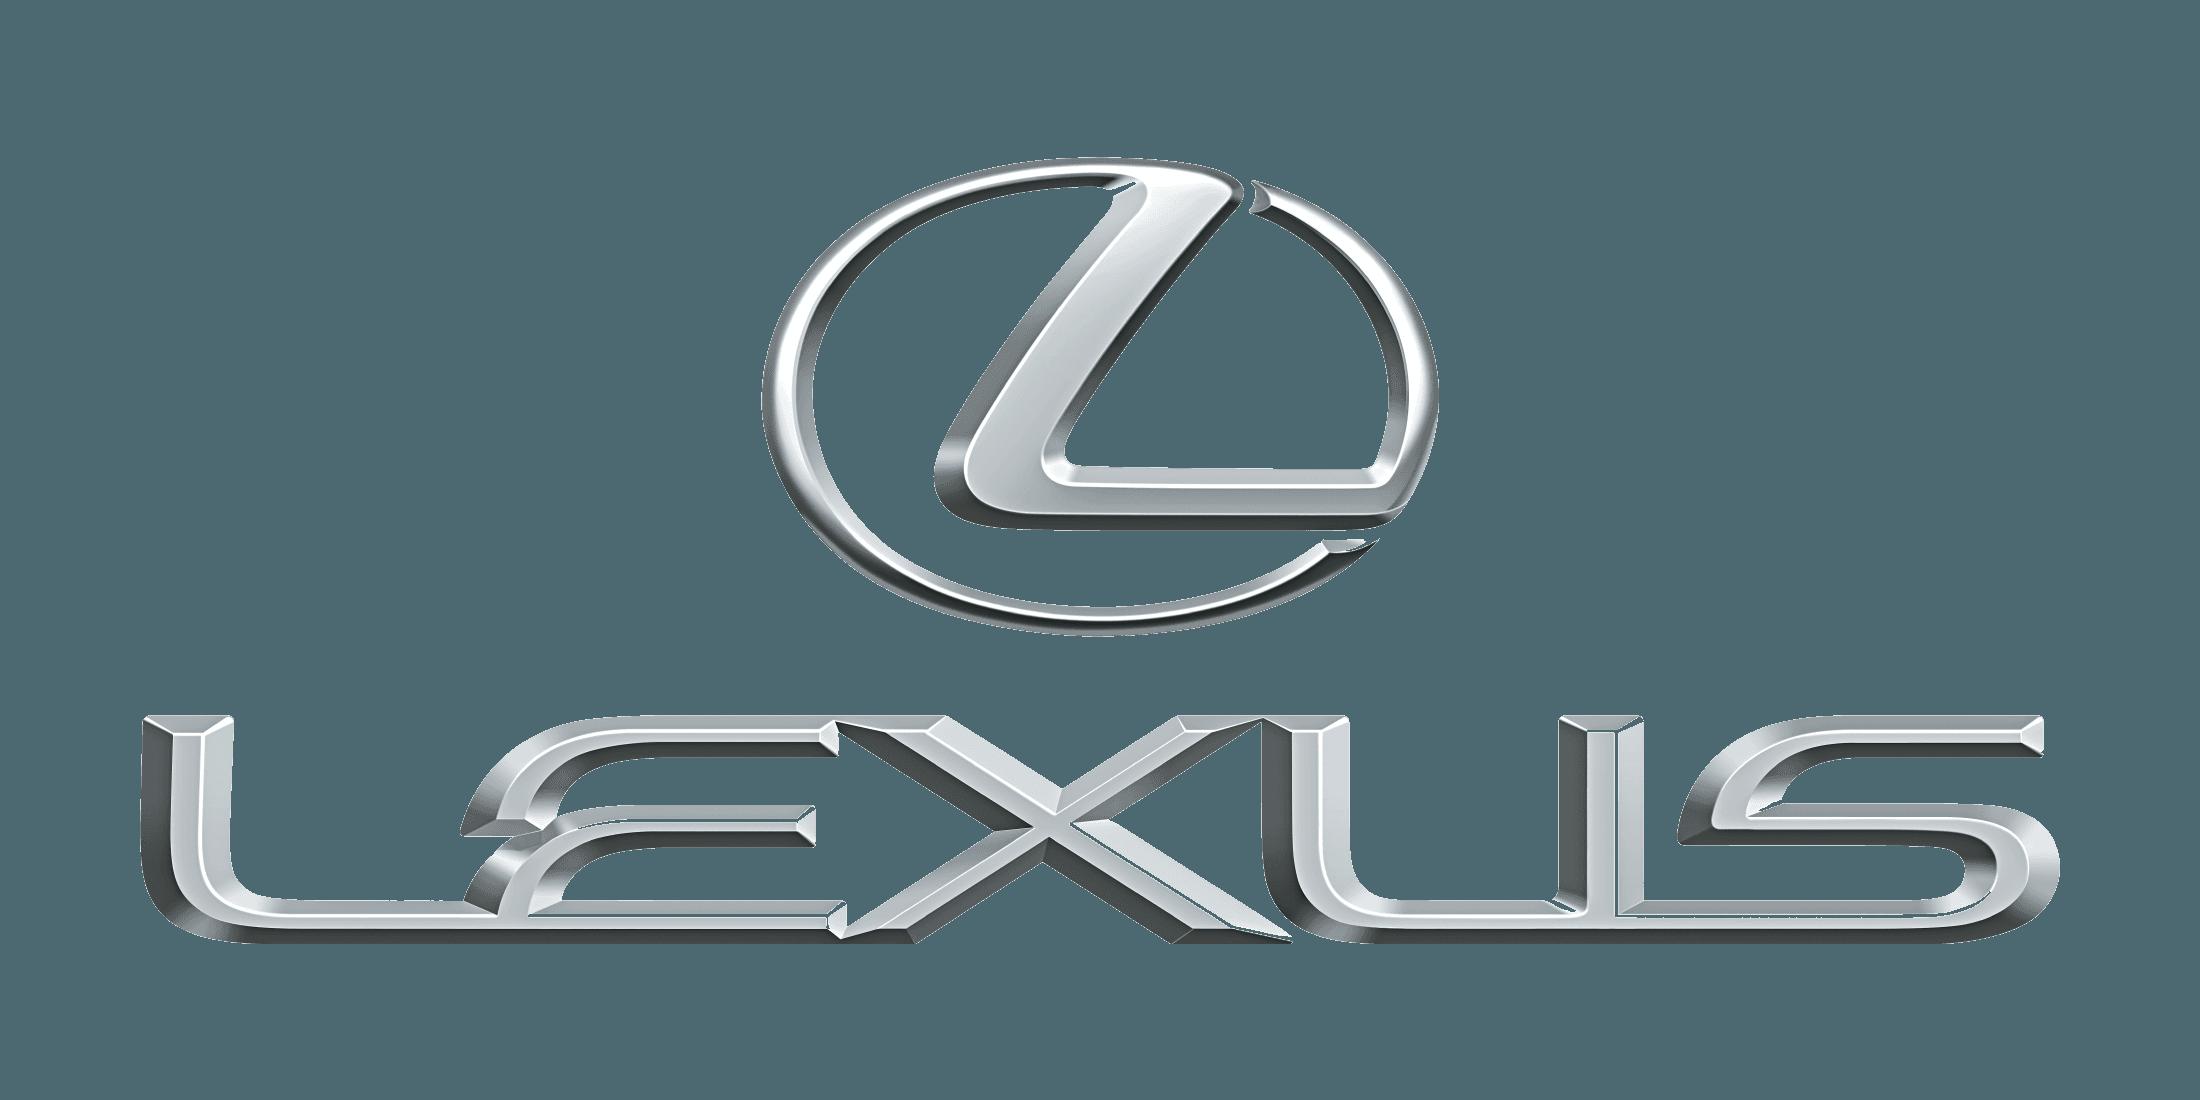 APEX Locksmith, APEX Denver Locksmith, Denver Locksmith, Lexus Car Key Replacement, Lost Lexus Car Keys